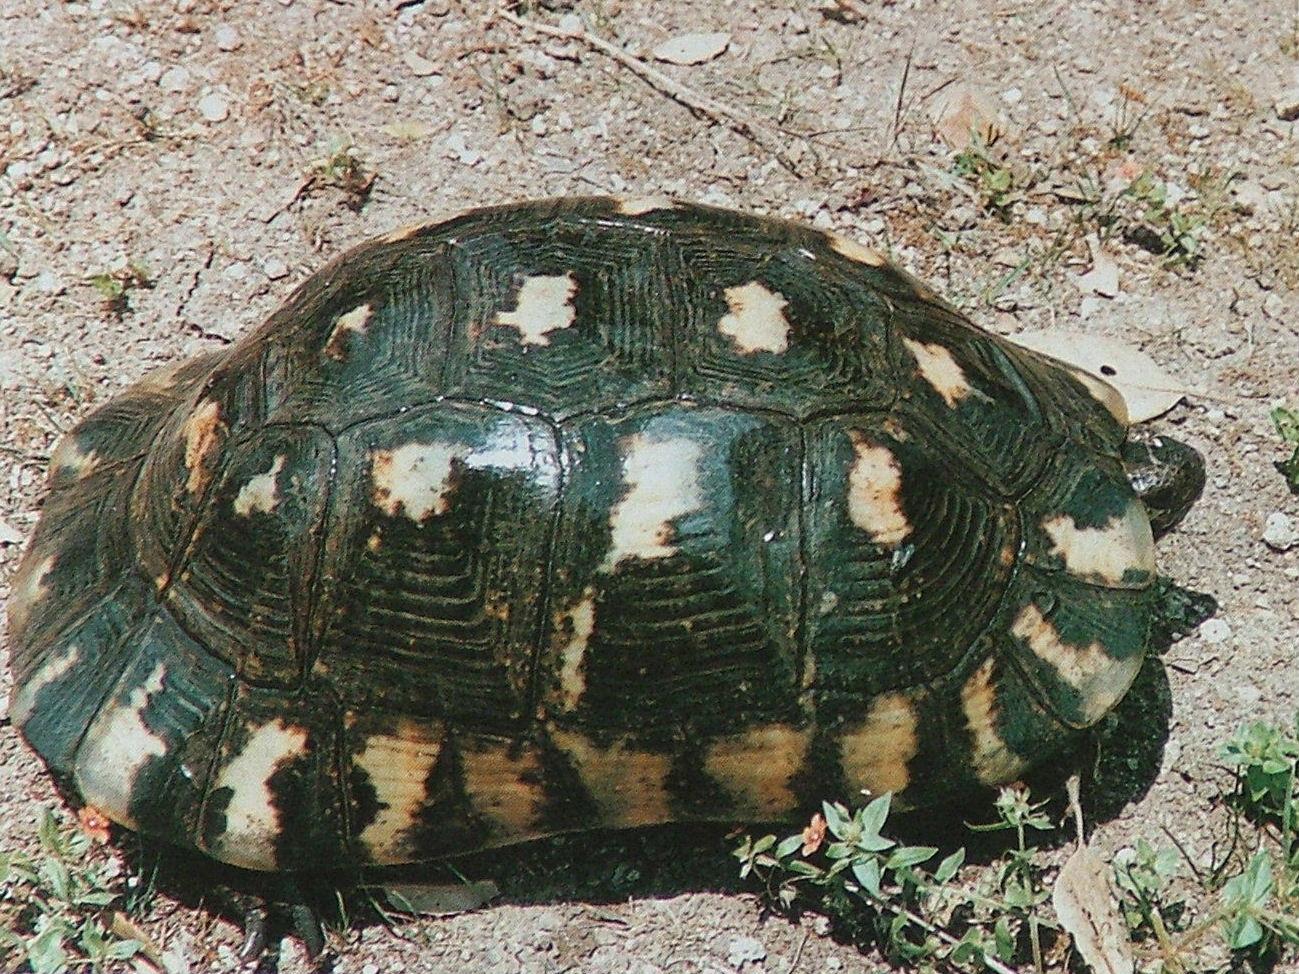 Mondo dei rettili letargo delle tartarughe terrestri for Tartarughe marine letargo